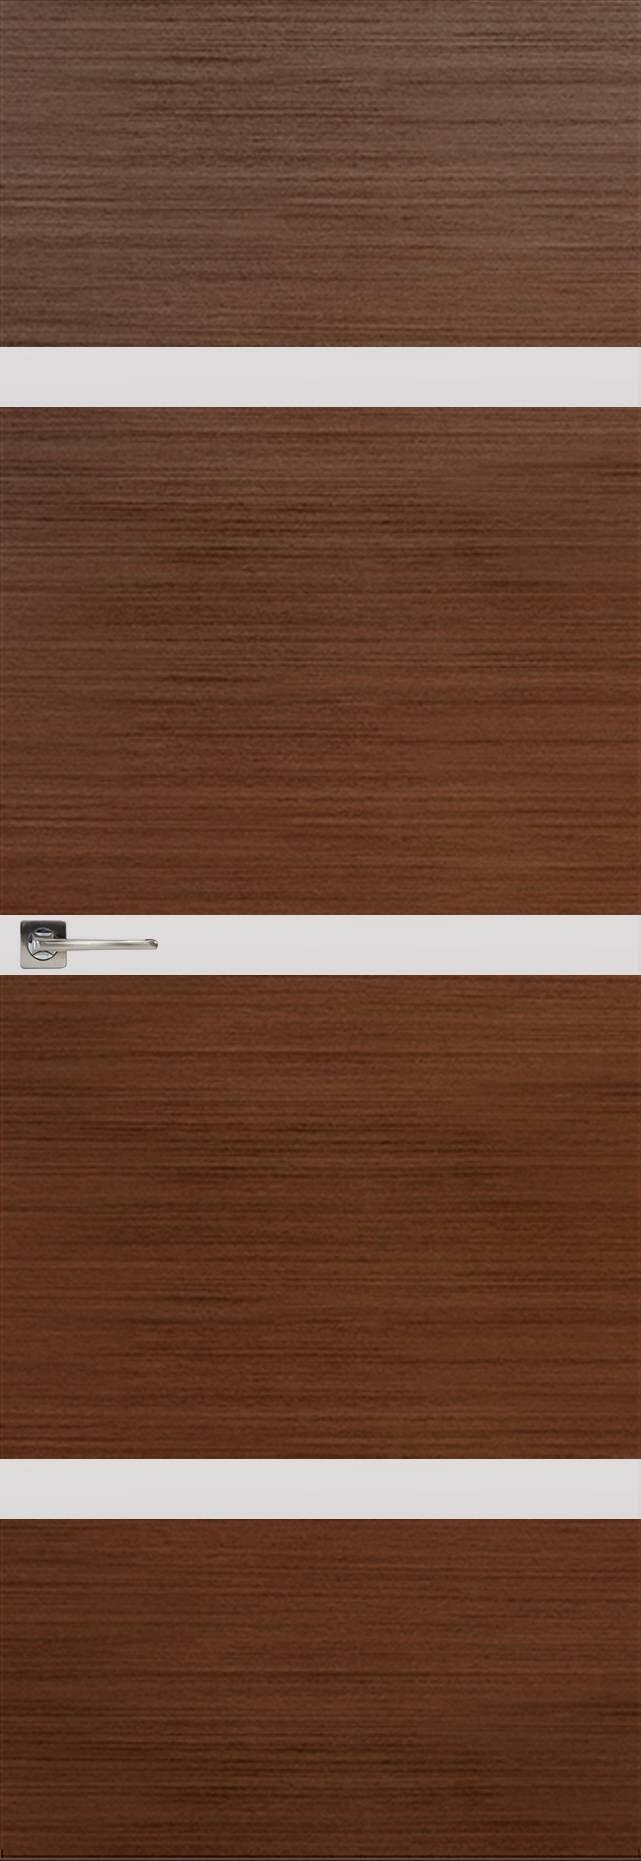 Tivoli Г-4 Invisible цвет - Темный орех Без стекла (ДГ)